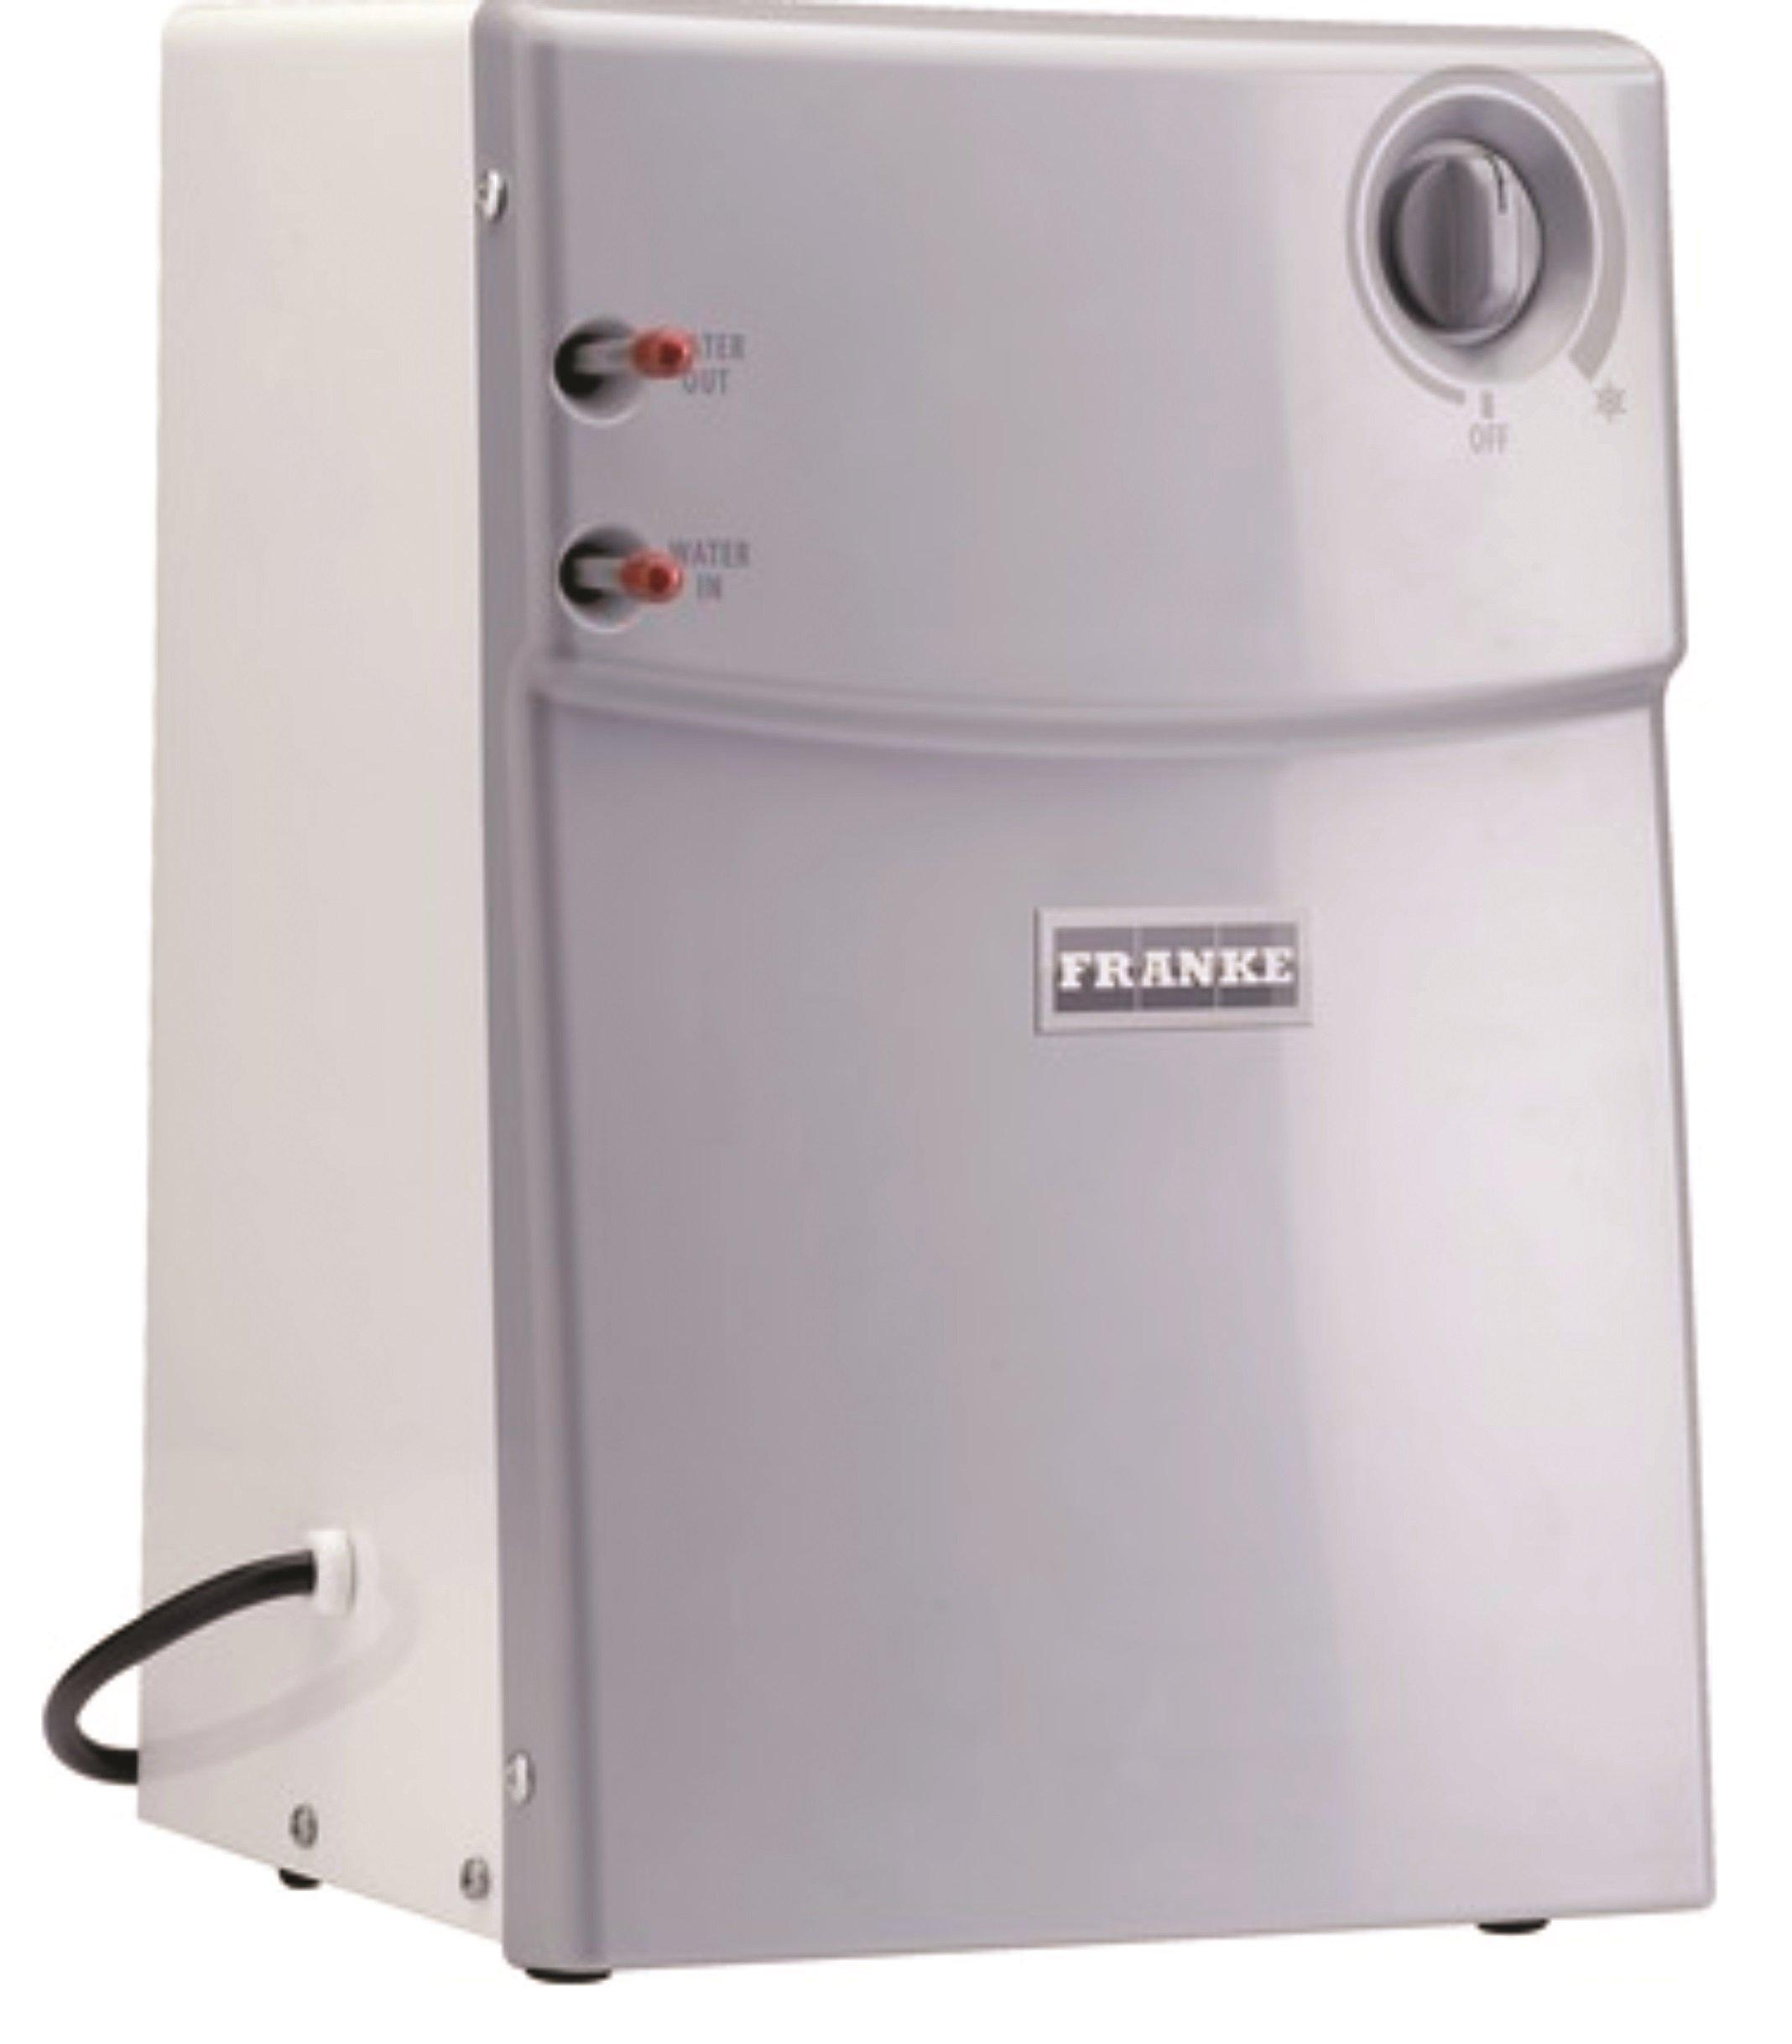 Franke CT-200 Little Butler Under Sink Filtration Cold Water Chiller Tank, White, Large, Stainless Steel